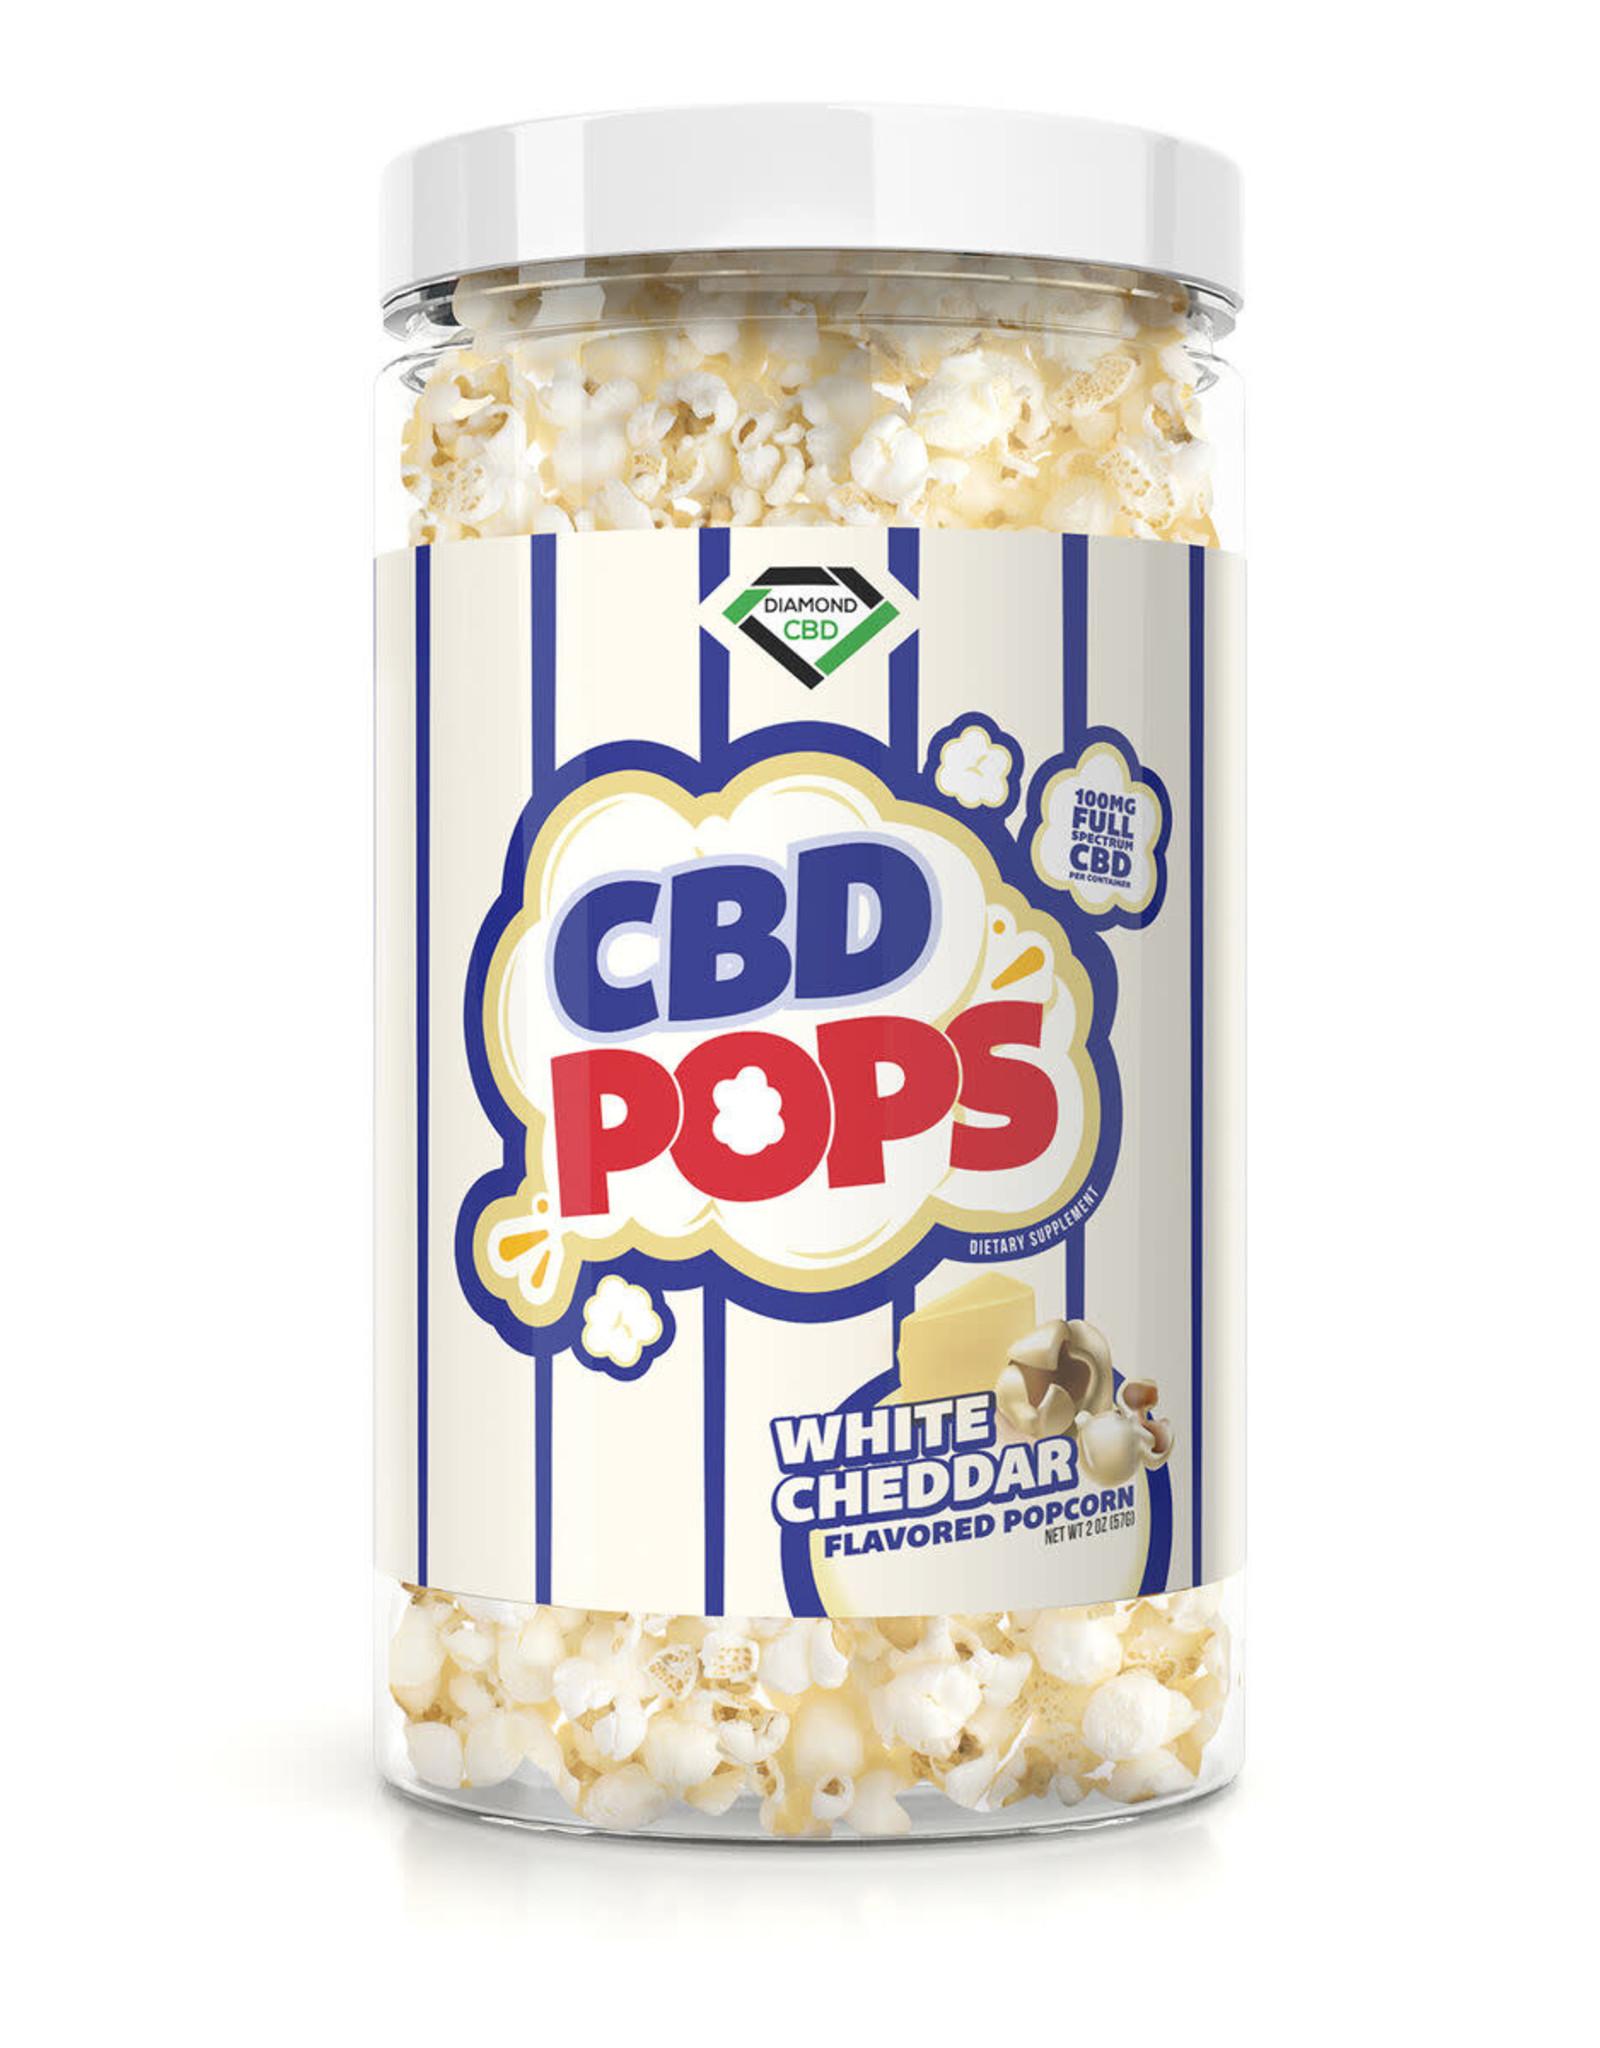 Diamond CBD White Cheddar Popcorn